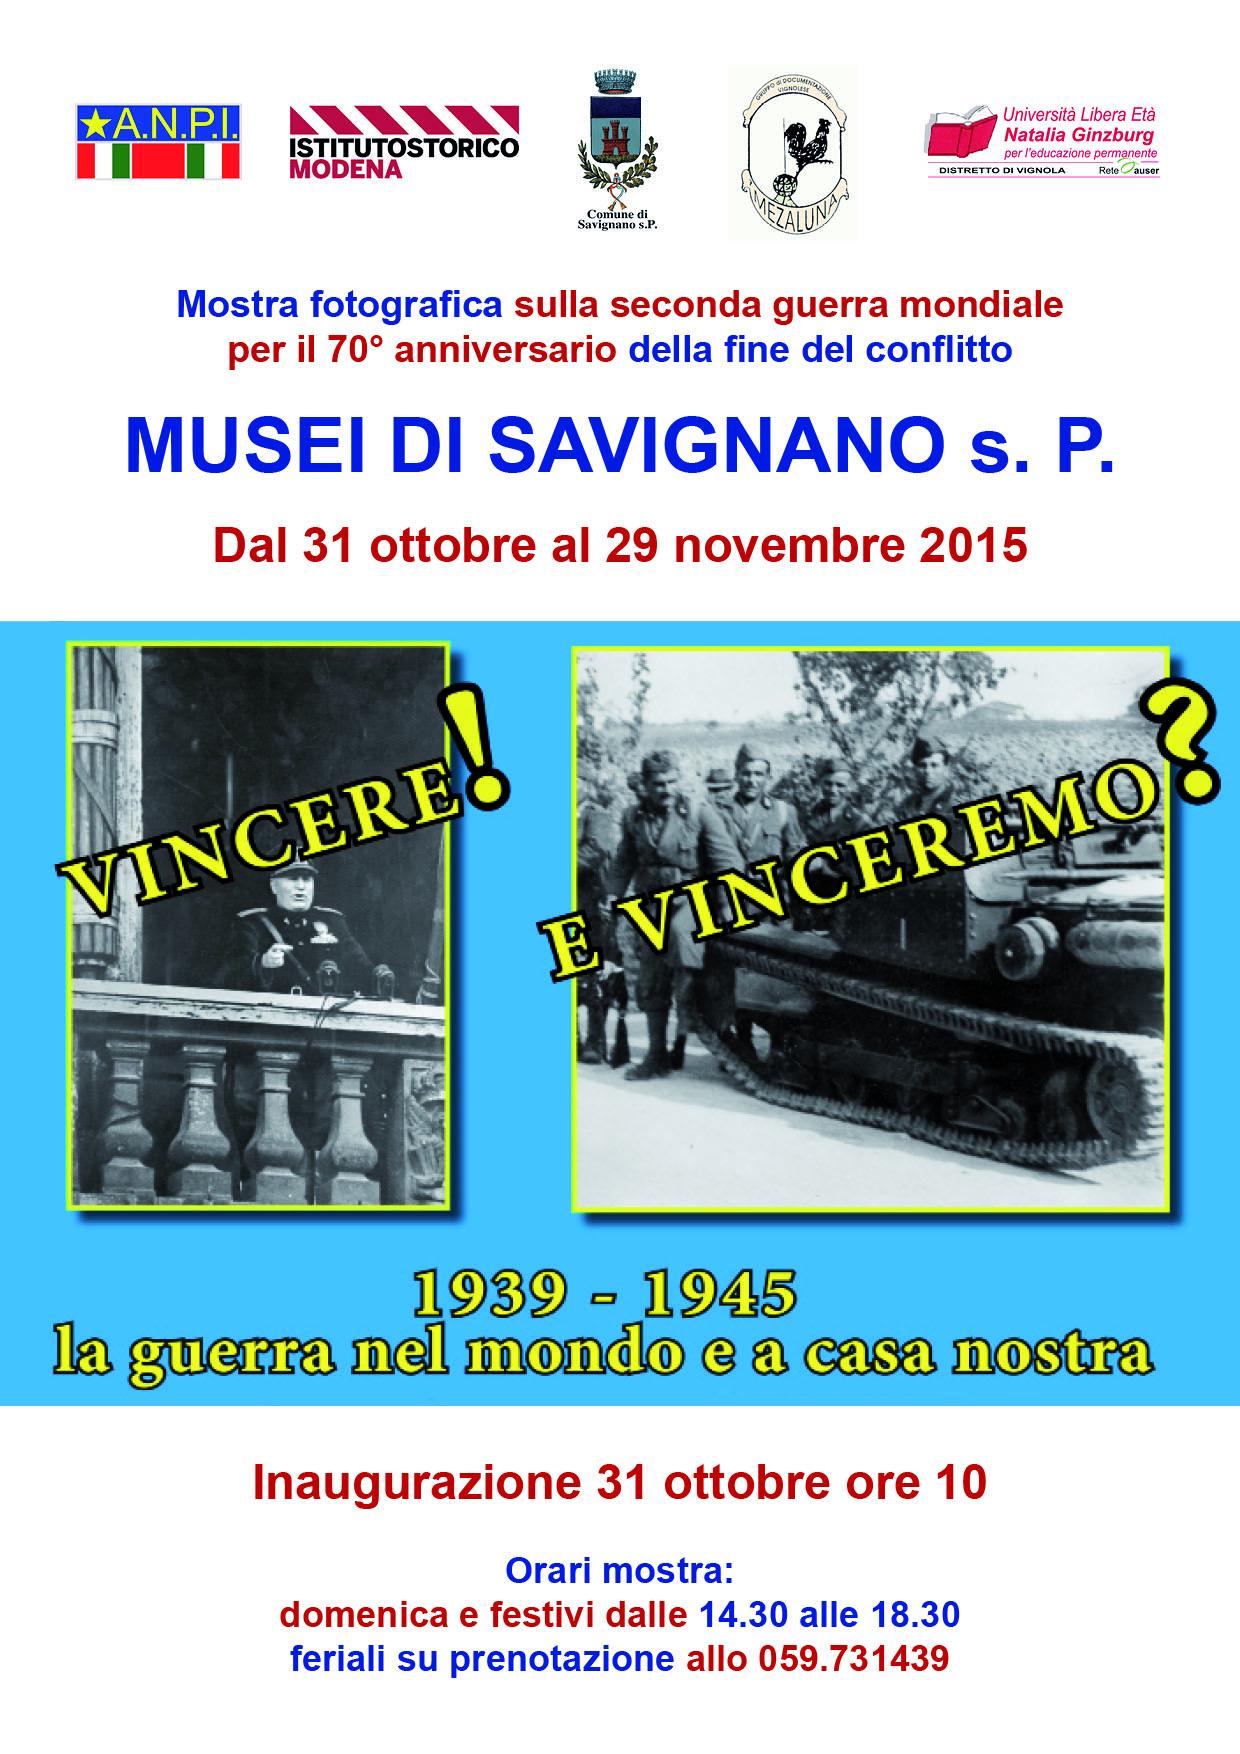 SAVIGNANO_Vincere mostra A4 (3)